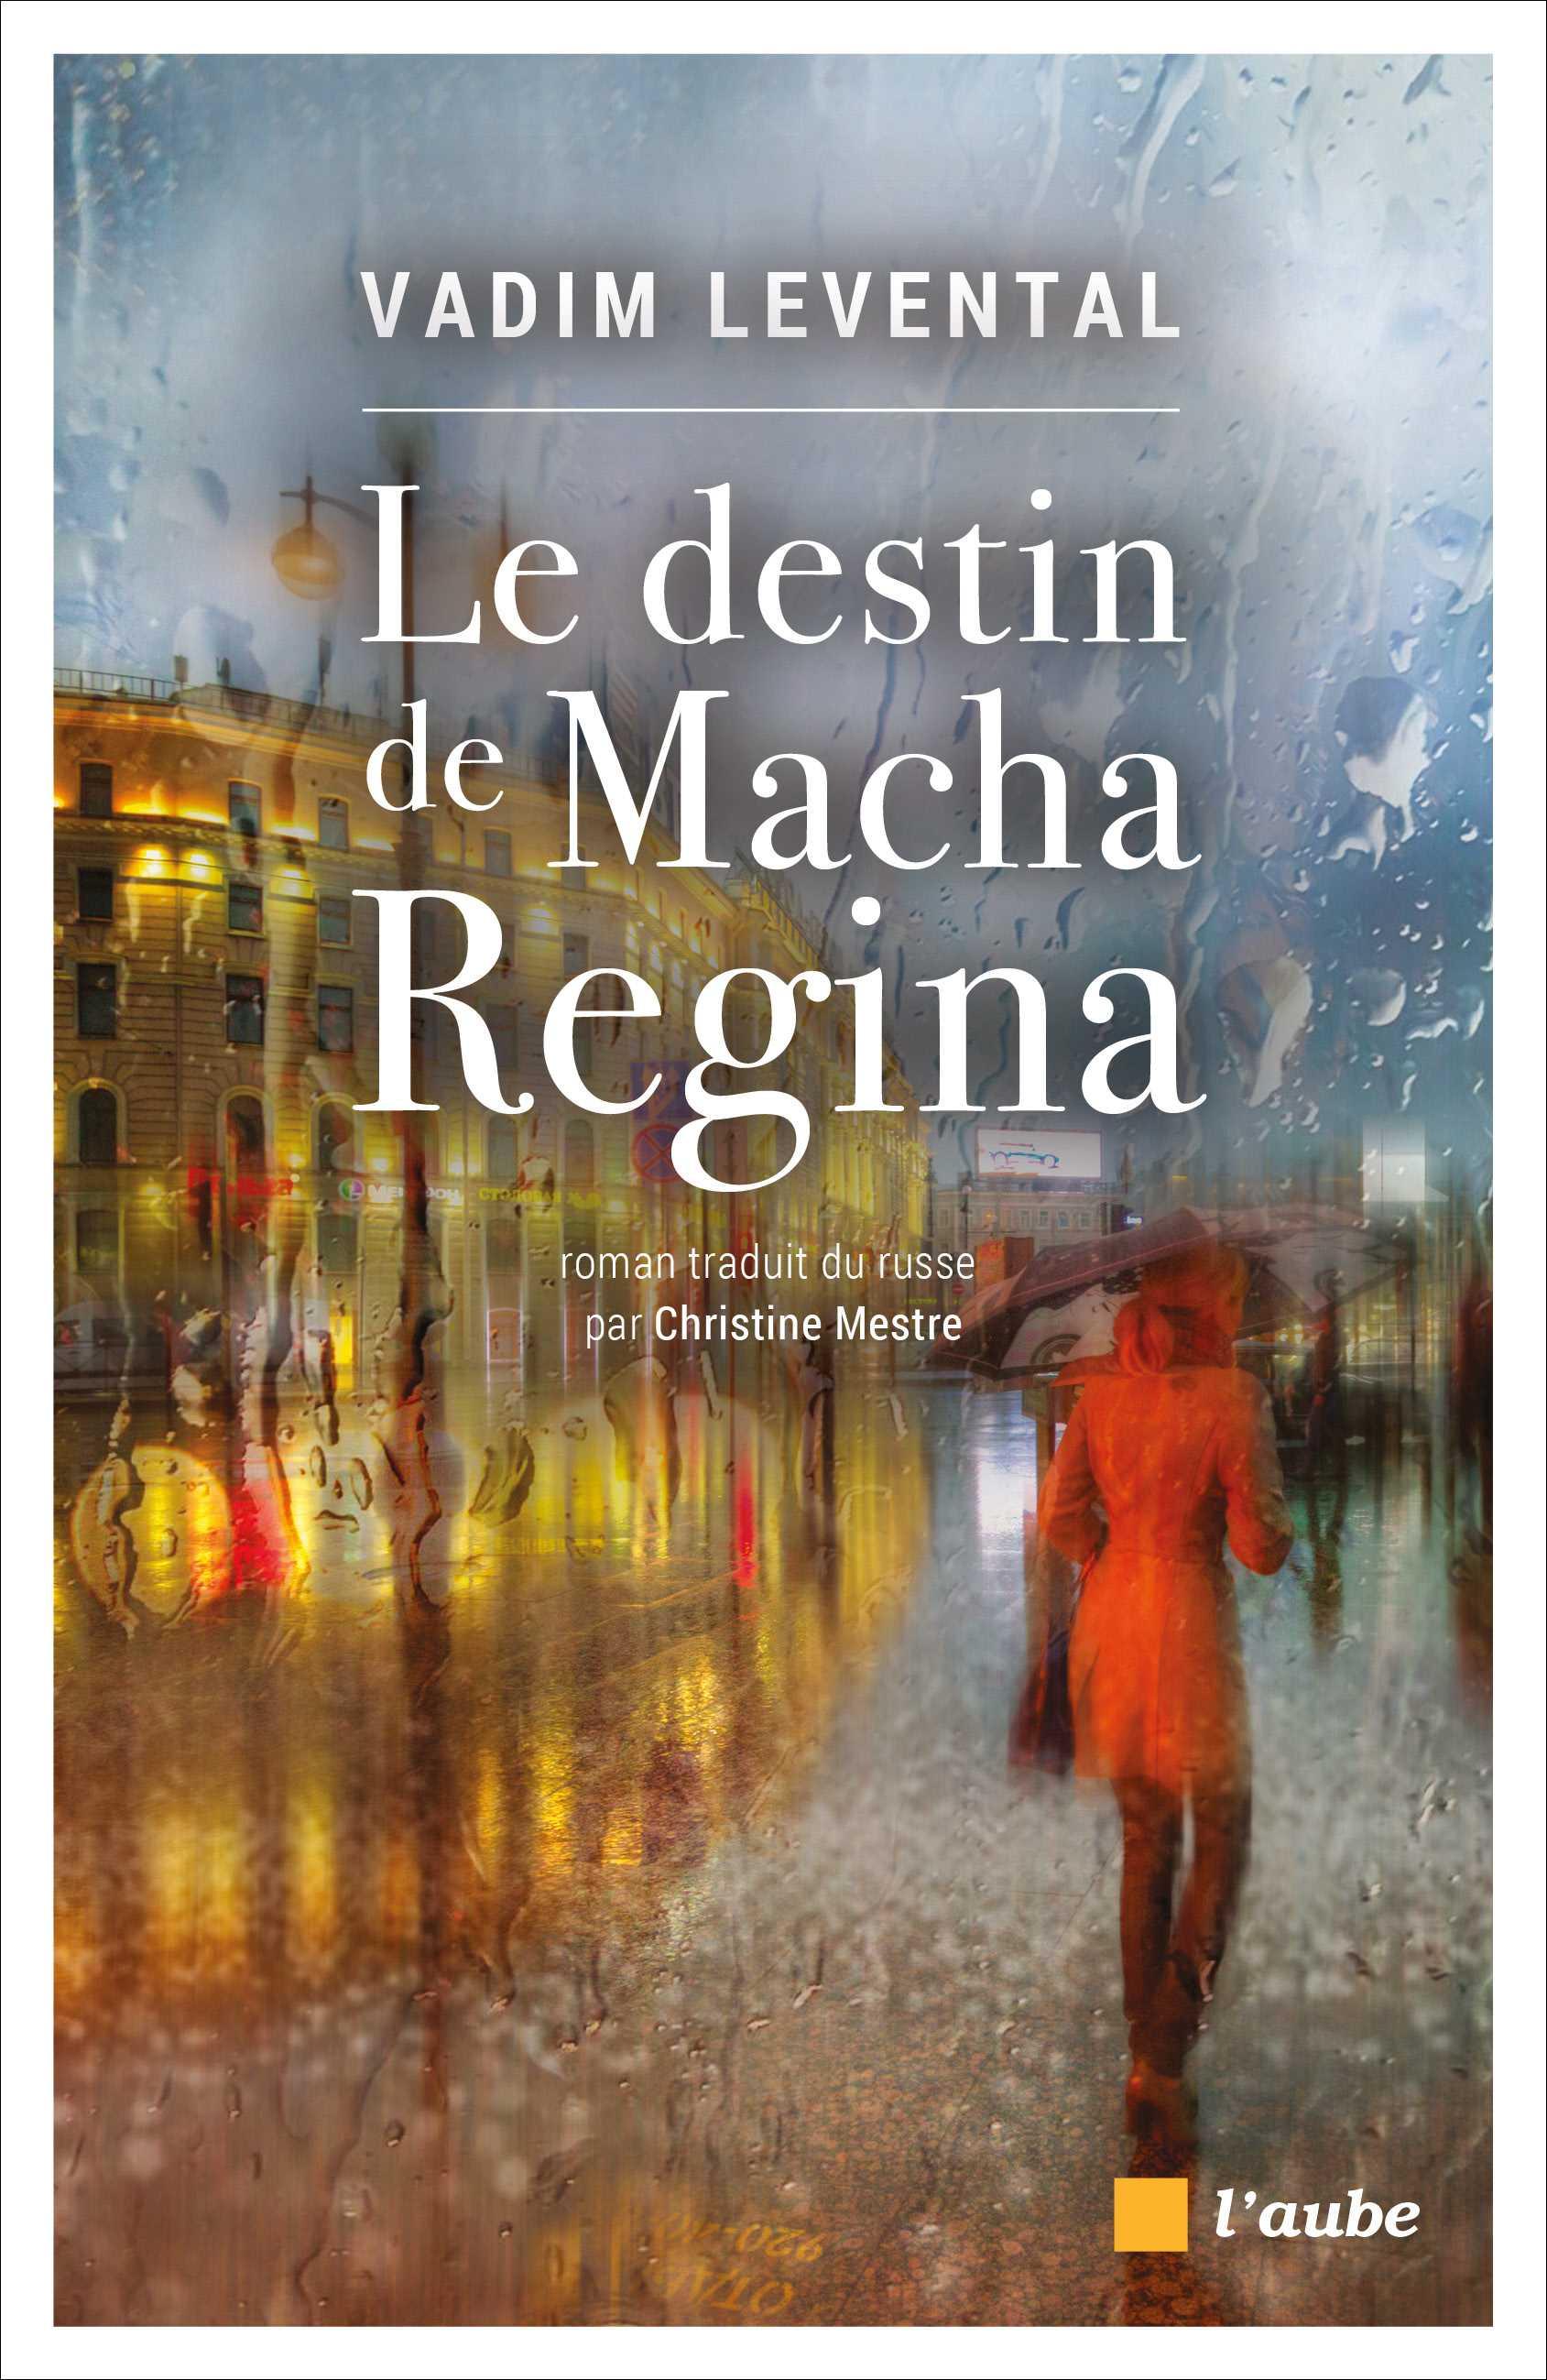 Le destin de Macha Regina